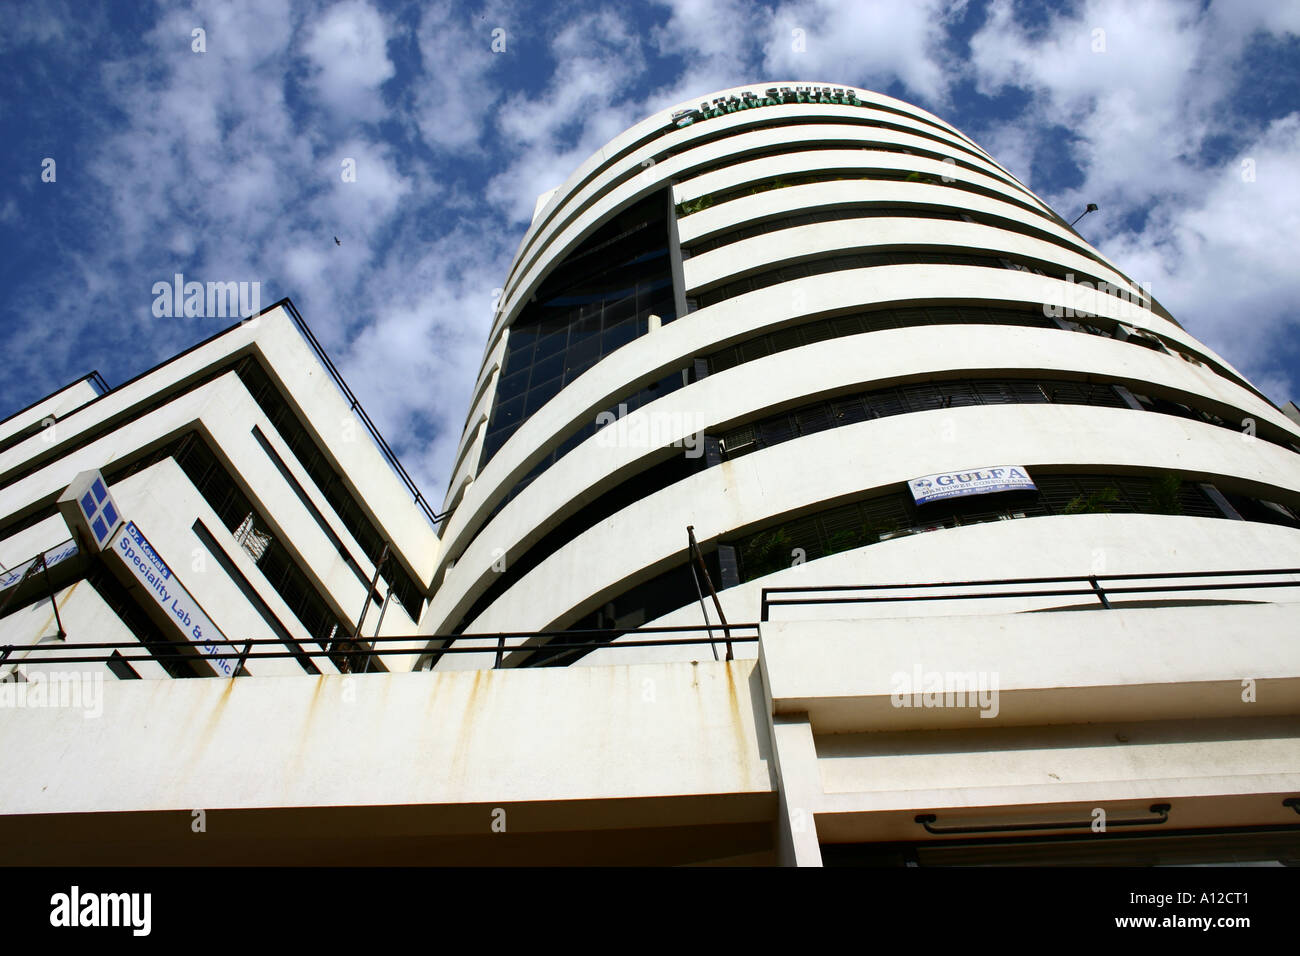 RSC75077 Moderno edificio de arquitectura india Andheri west india de Maharastra Mumbai Imagen De Stock